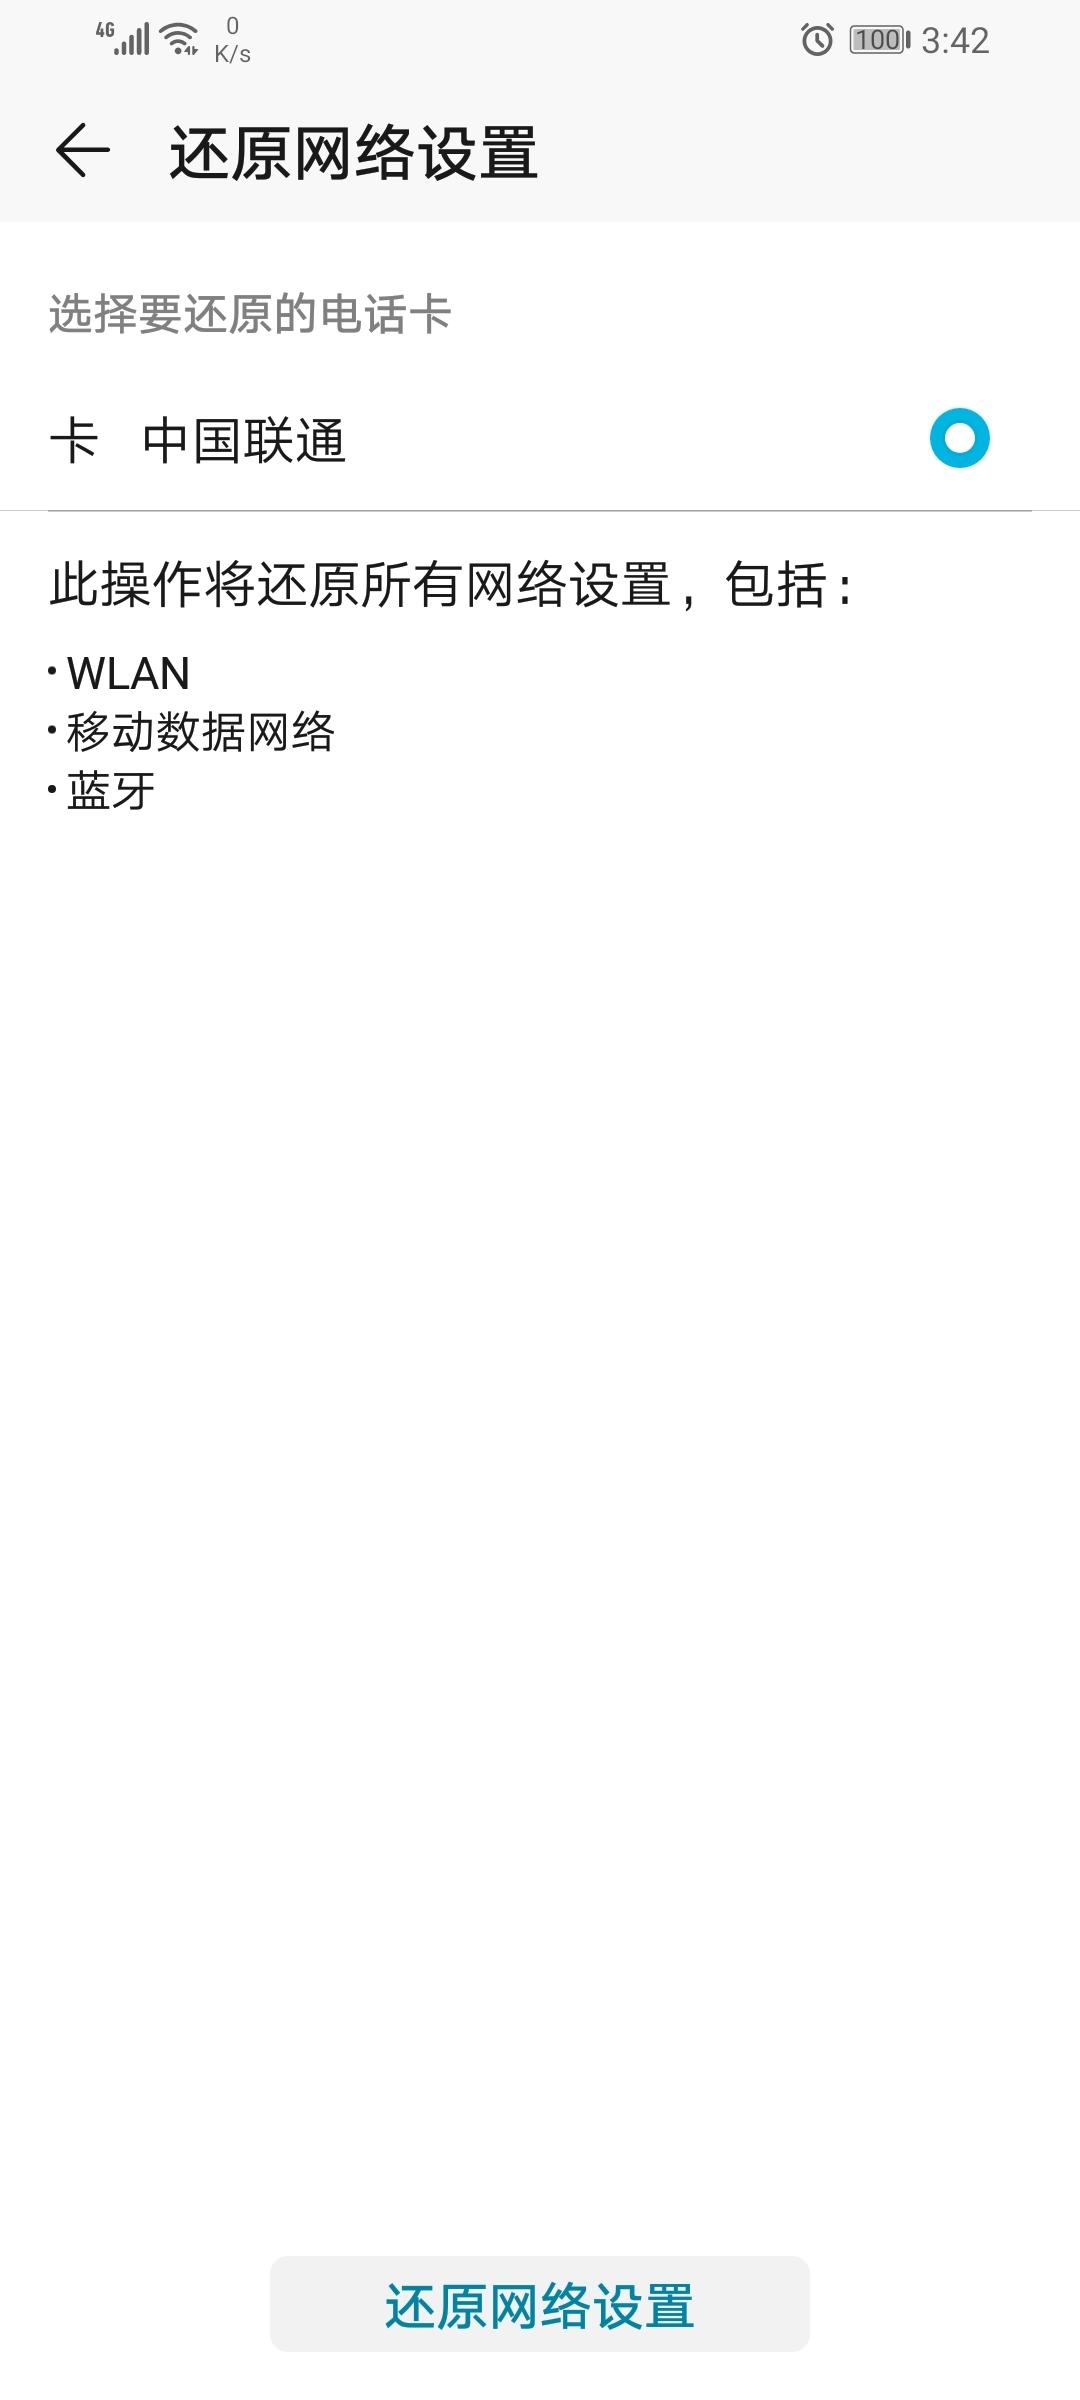 Screenshot_20200515_154234_com.android.settings.jpg